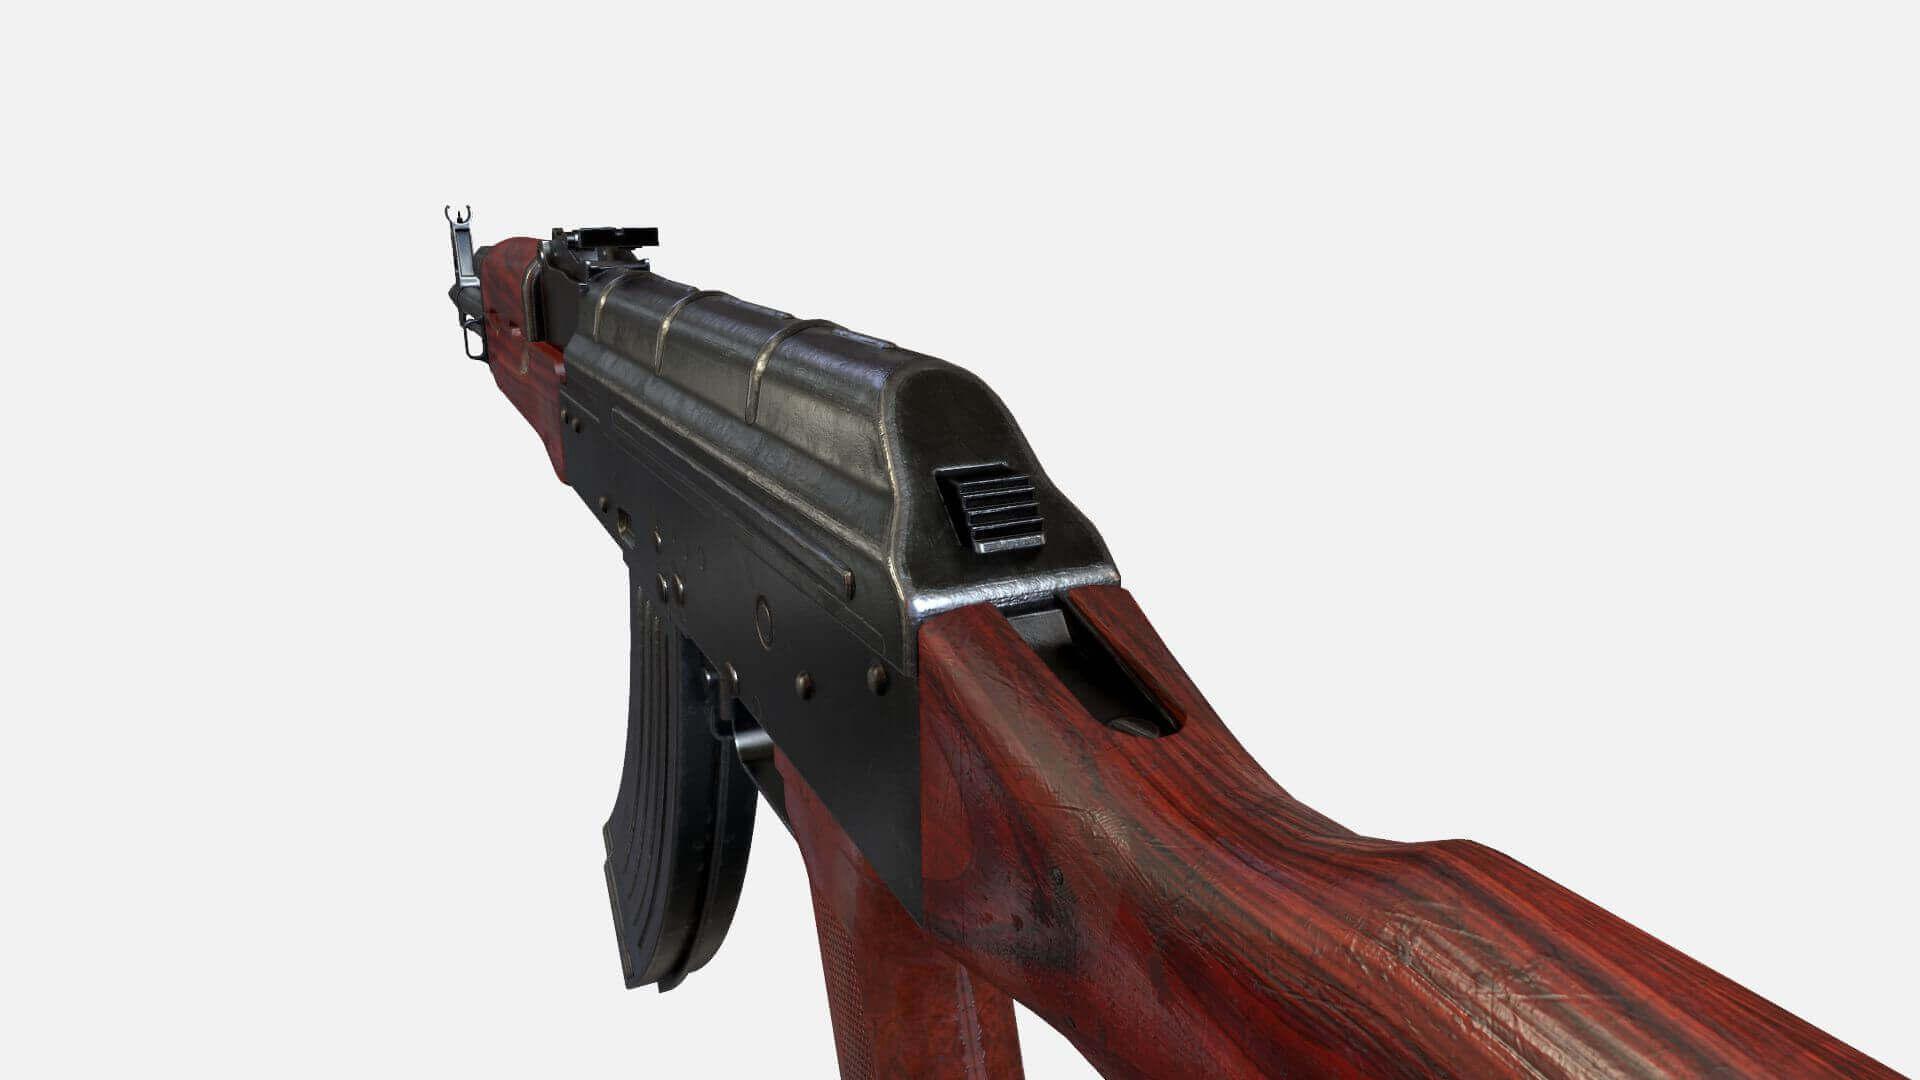 AKM Assault Rifle AK-47 3D Model